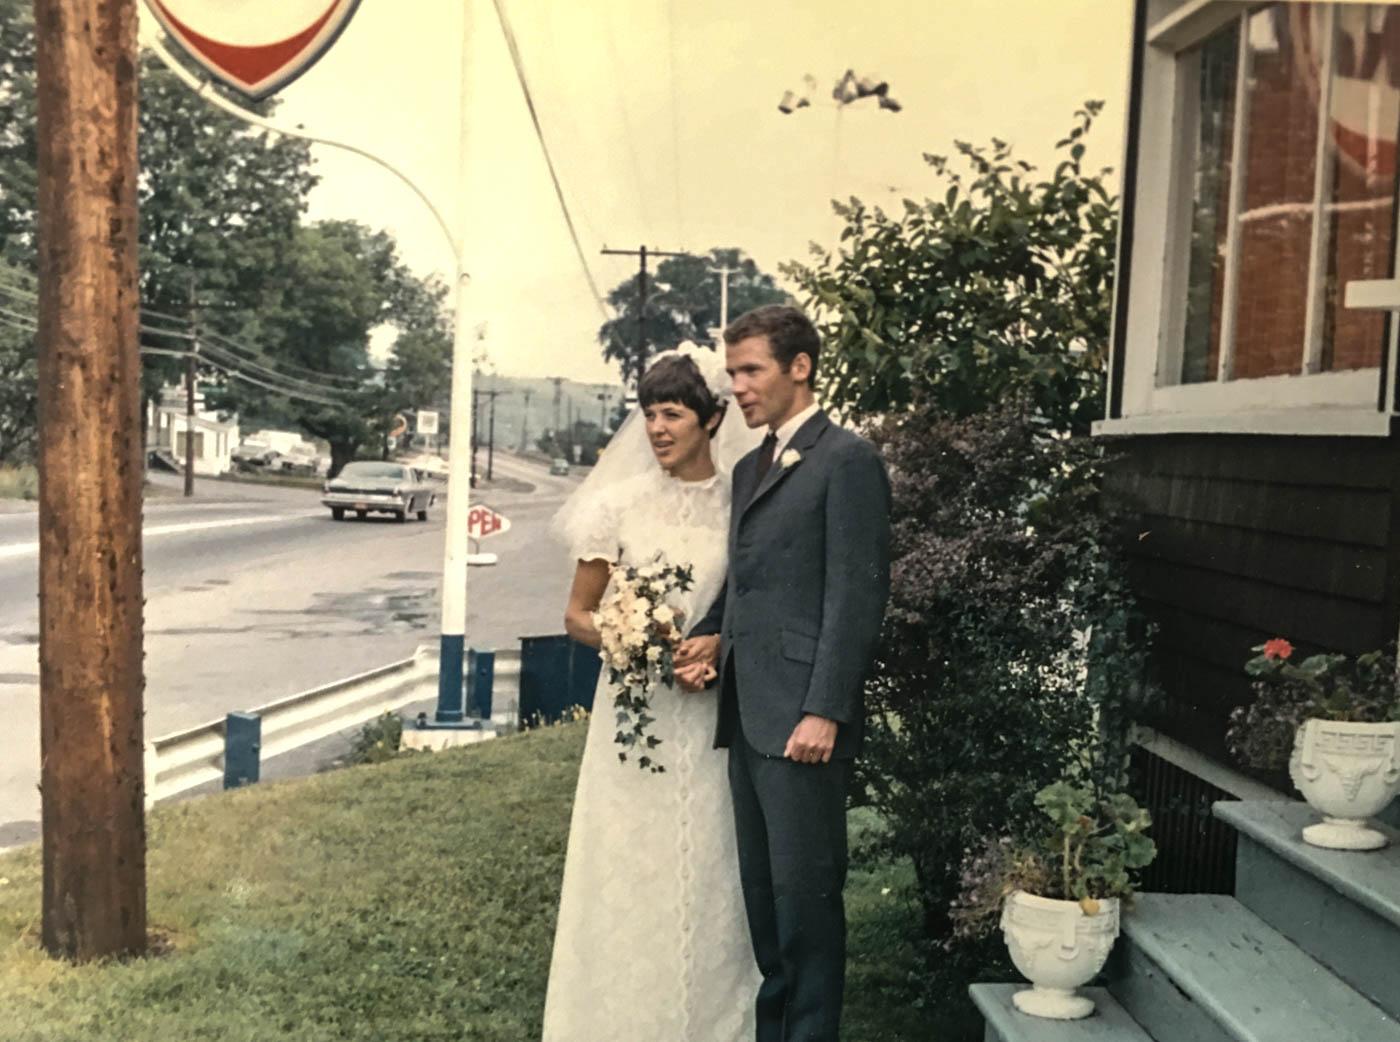 parents wedding fina sign